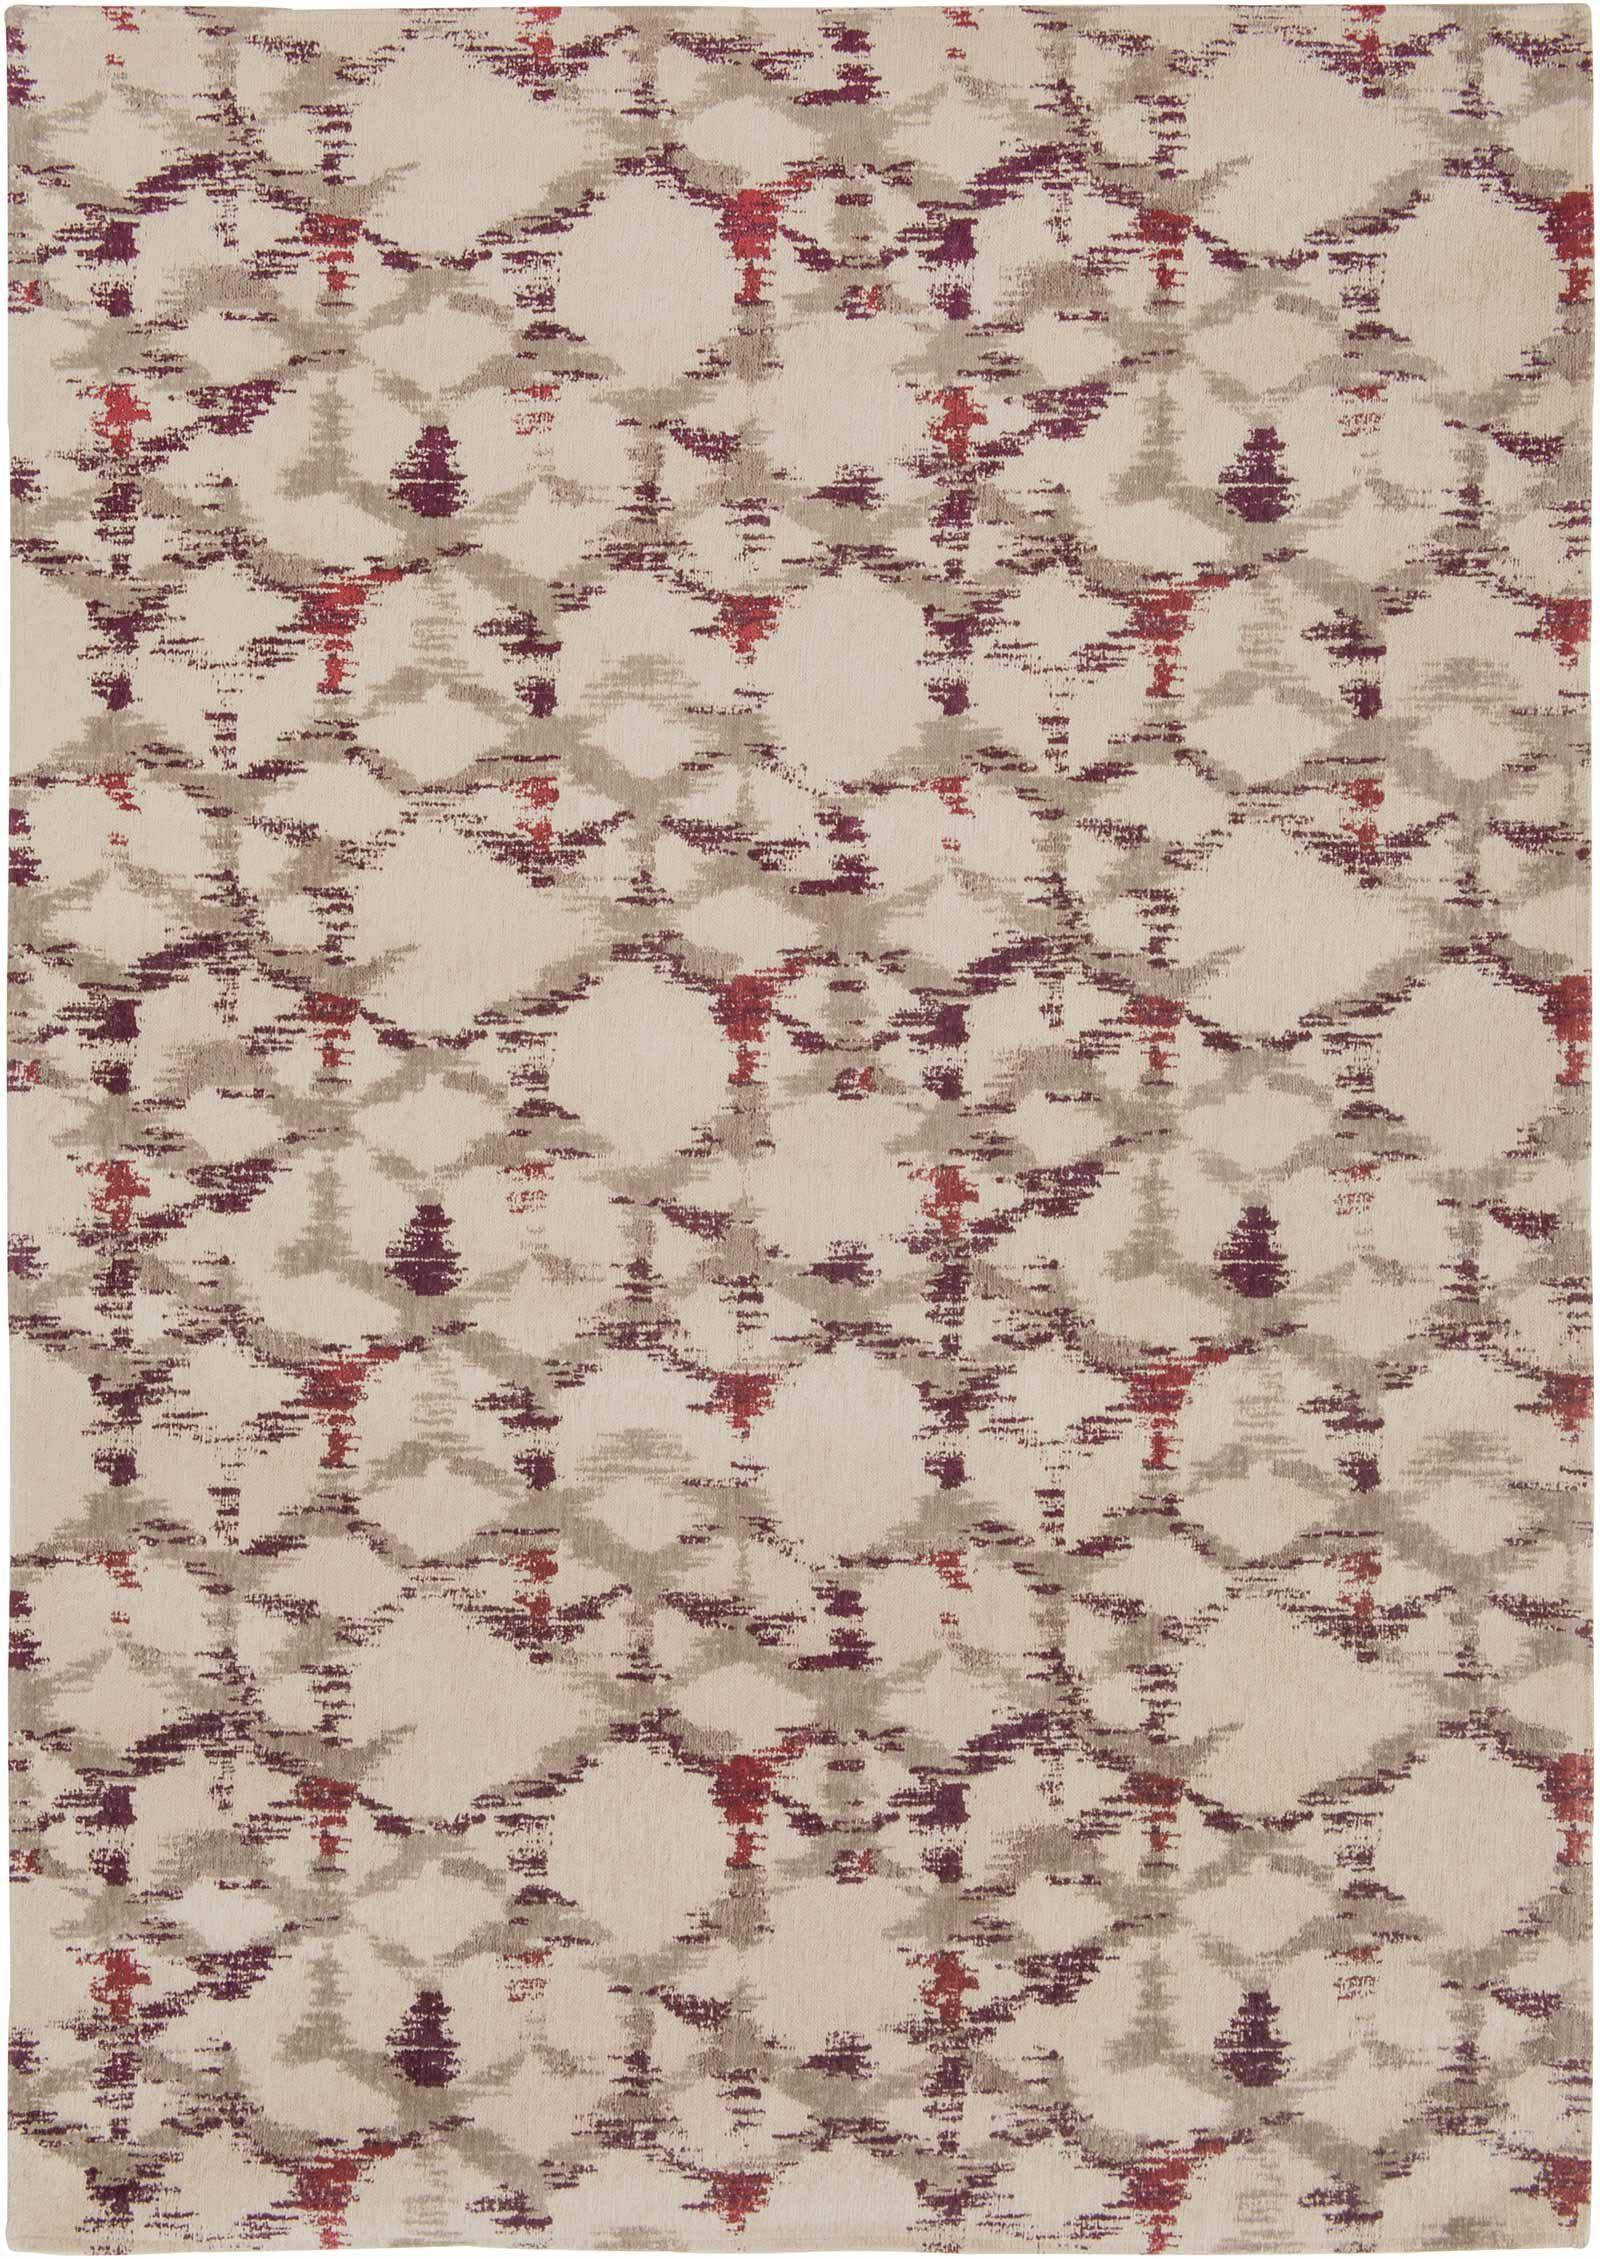 Louis De Poortere alfombras Villa Nova LX 8752 Sudare Jewel